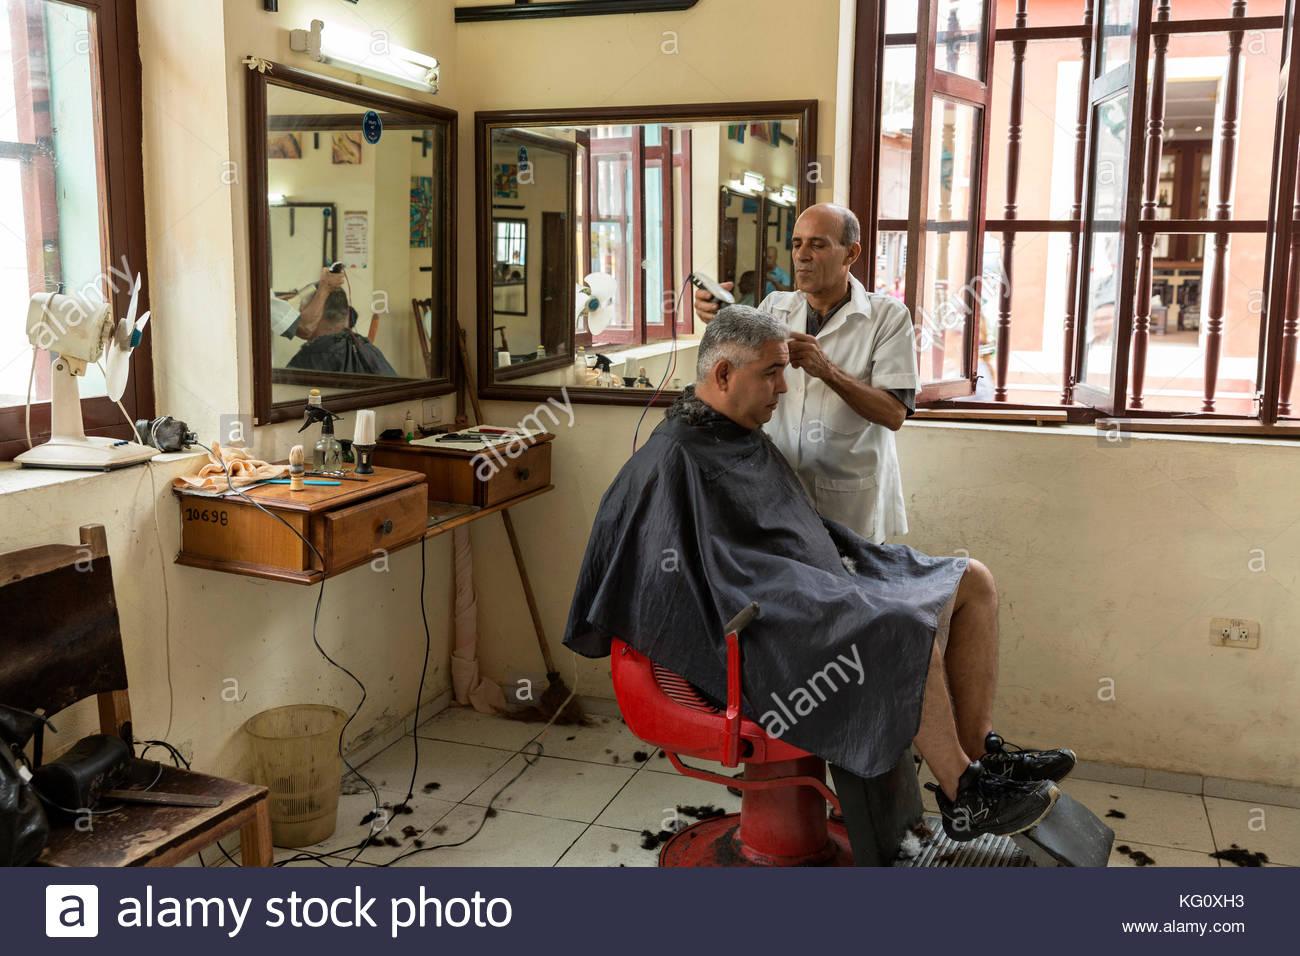 Friseurladen in Baracoa, Kuba engl.: Cuba, baracoa, Barbershop Stockbild